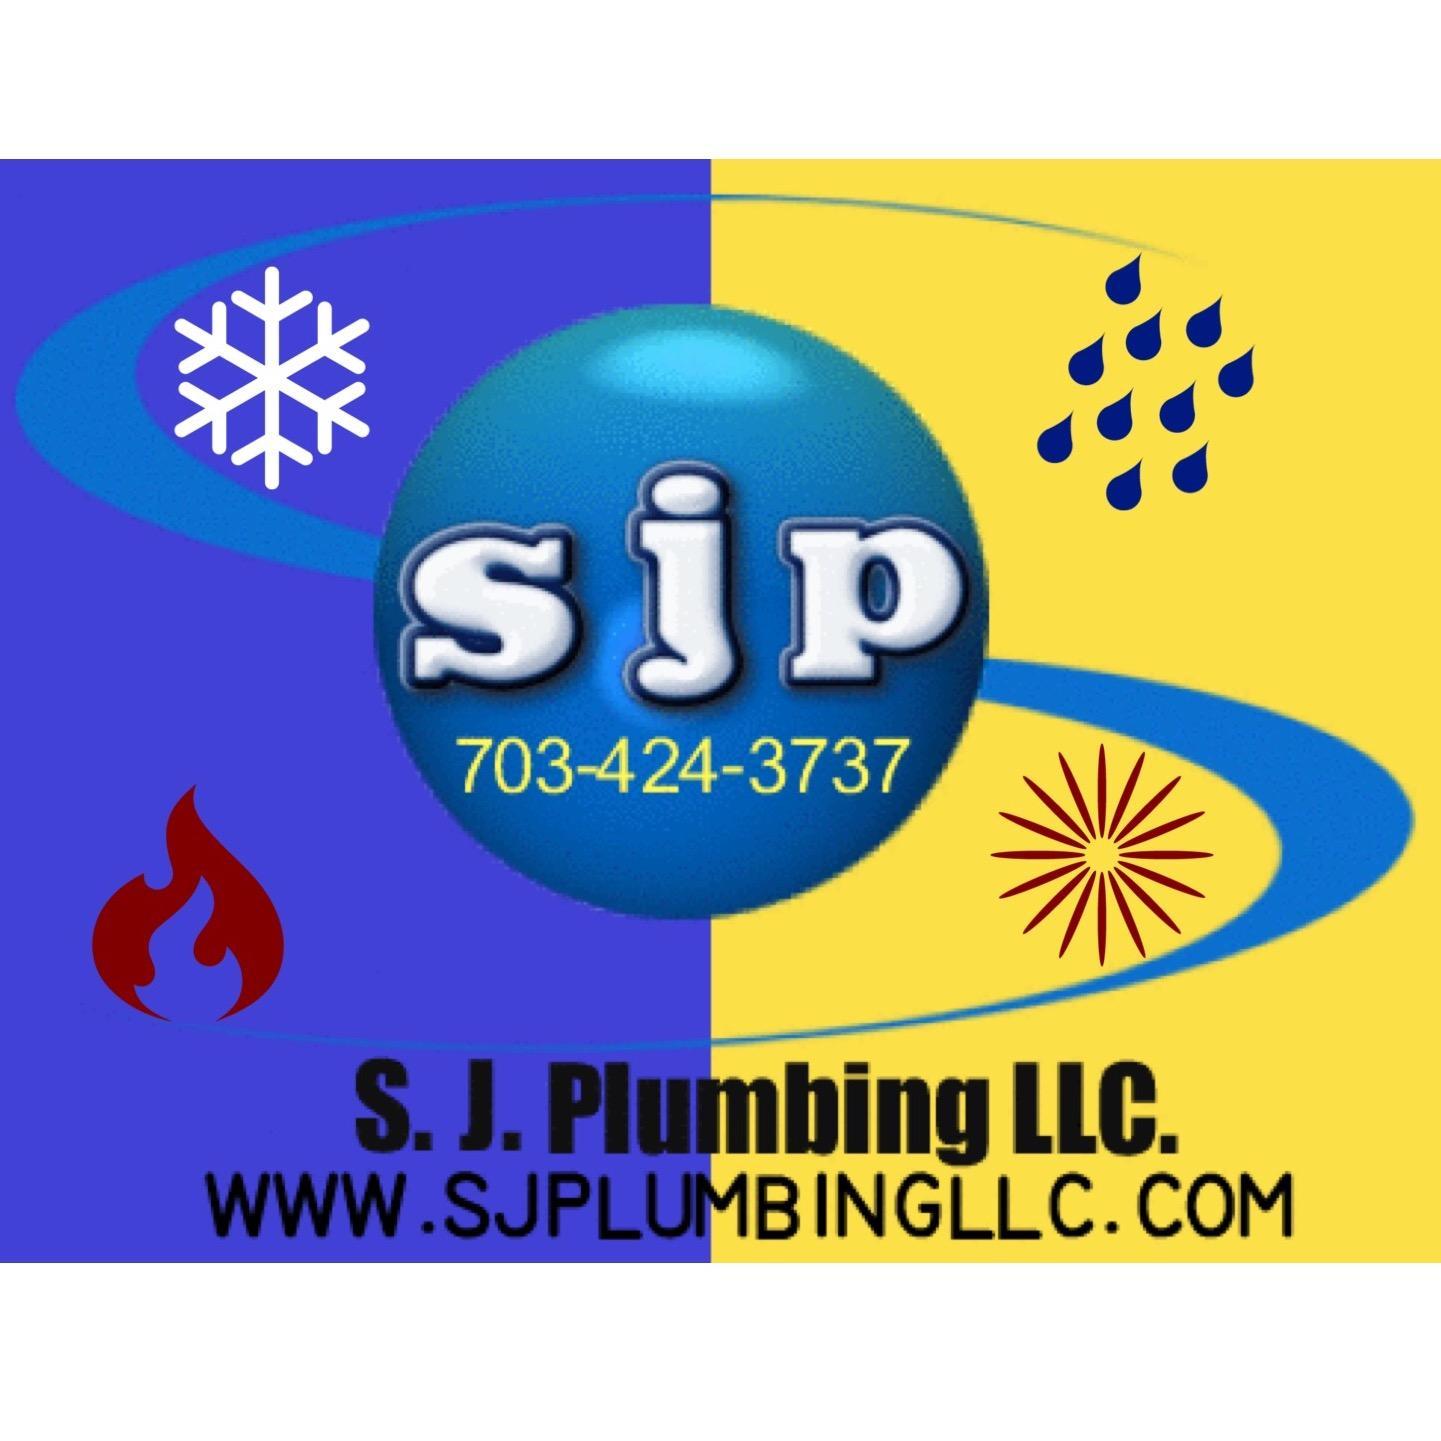 S.J. Plumbing LLC